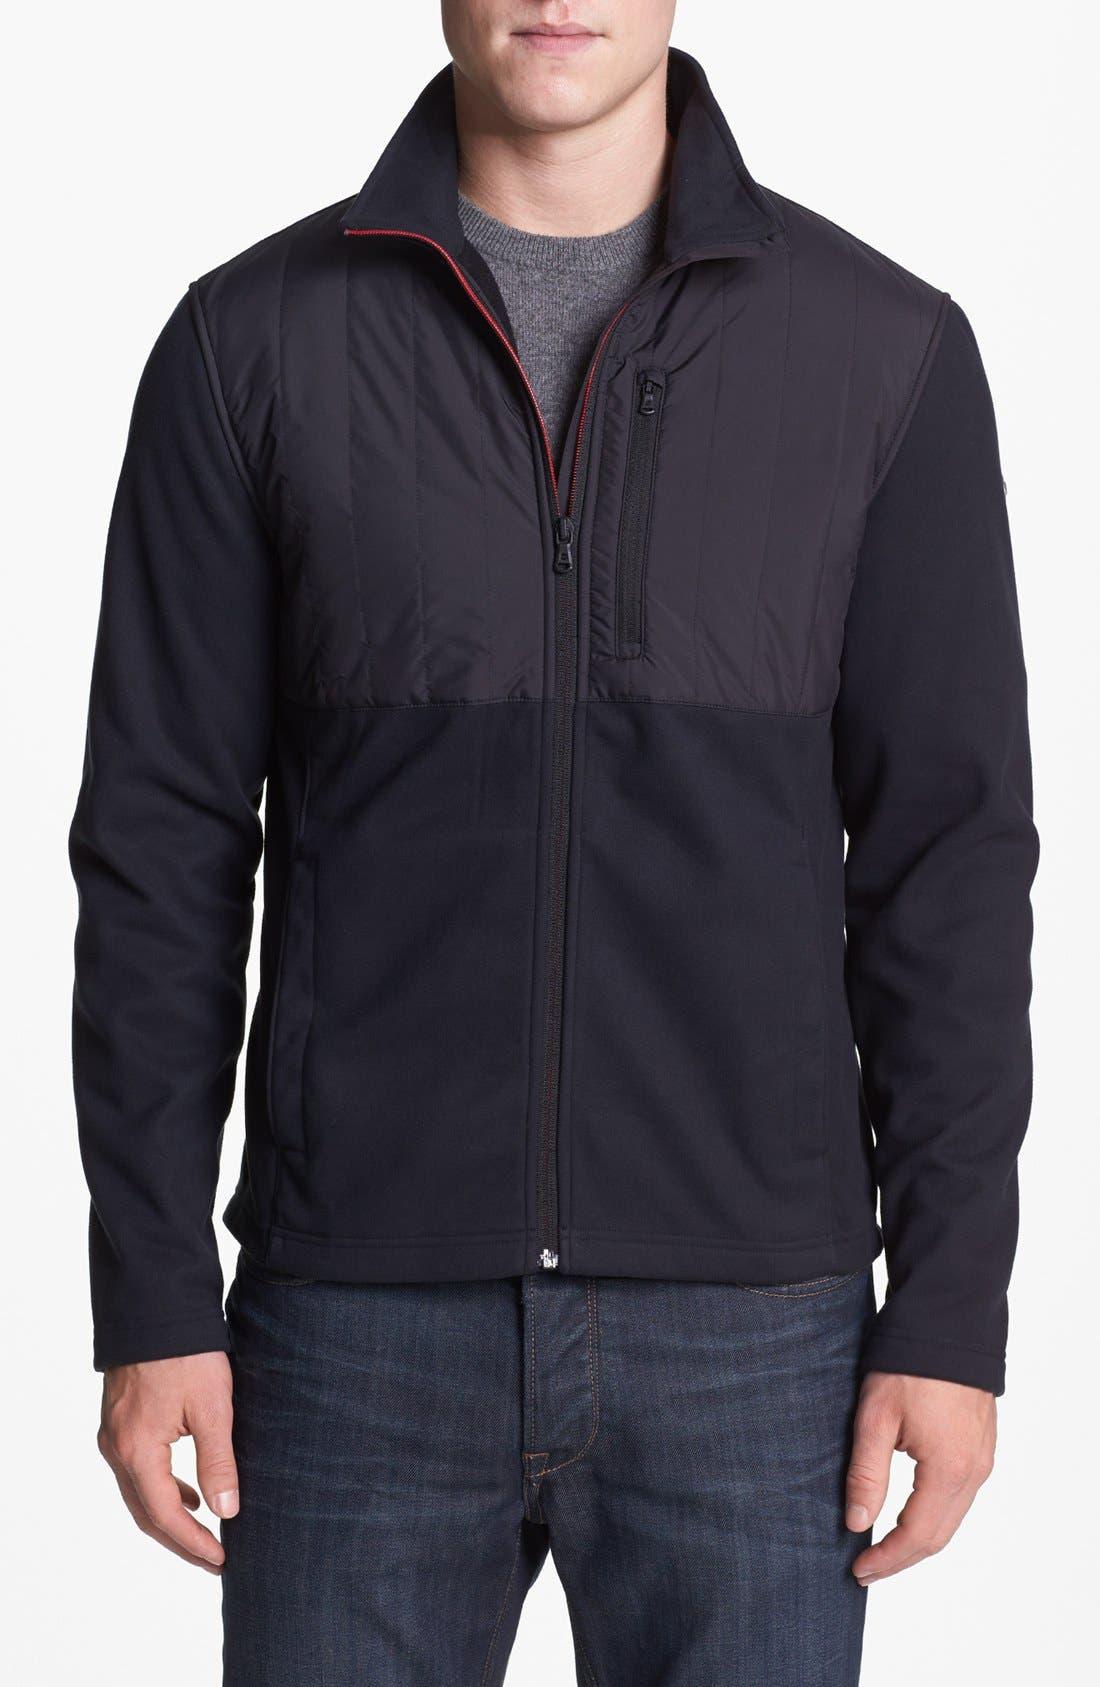 Alternate Image 1 Selected - Victorinox Swiss Army® 'Matterhorn' Tailored Fit Fleece Jacket